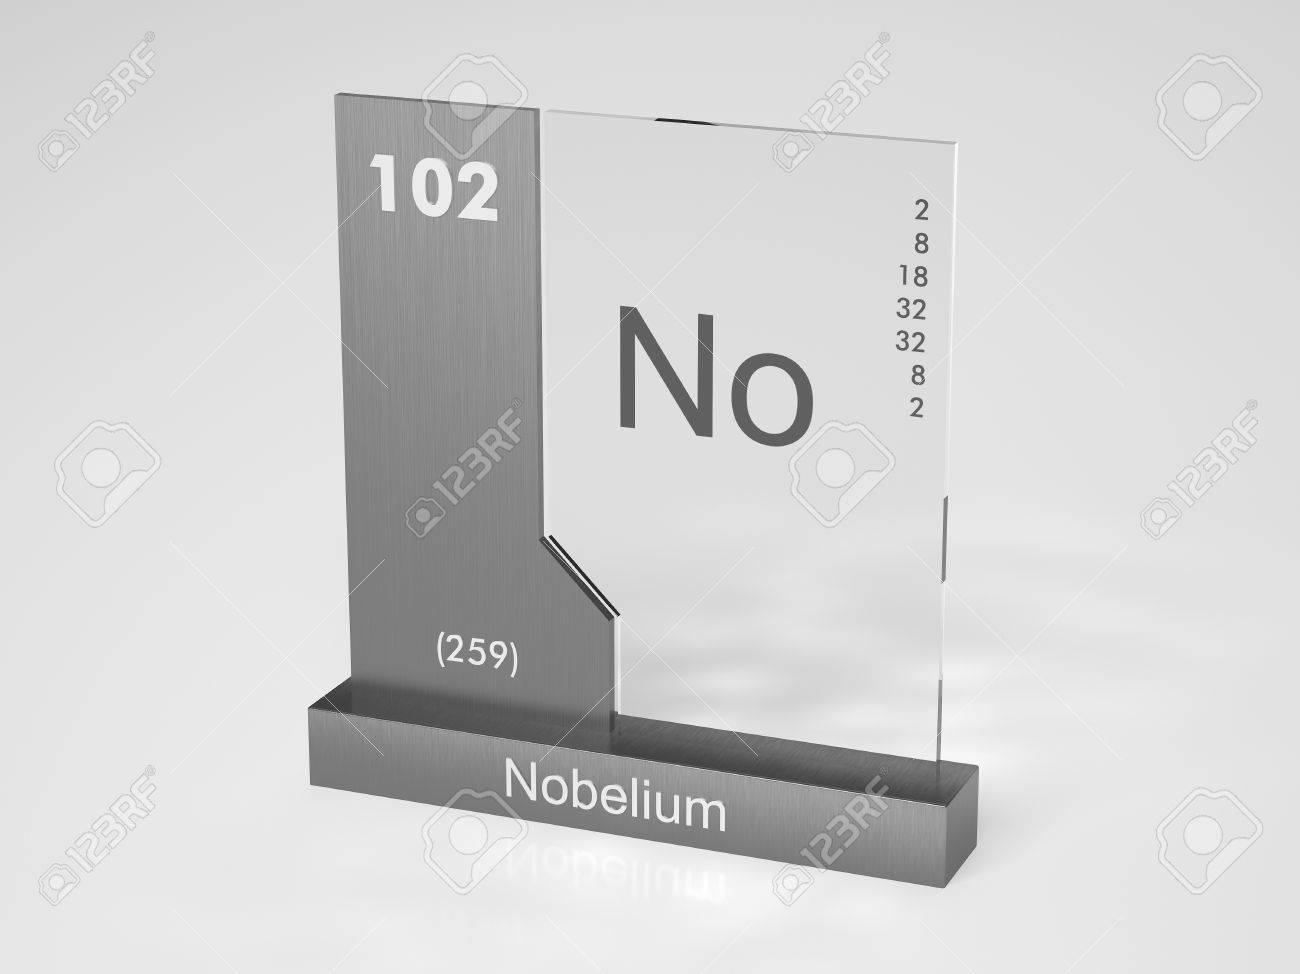 Nobelium symbol no chemical element of the periodic table nobelium symbol no chemical element of the periodic table stock photo 11597105 buycottarizona